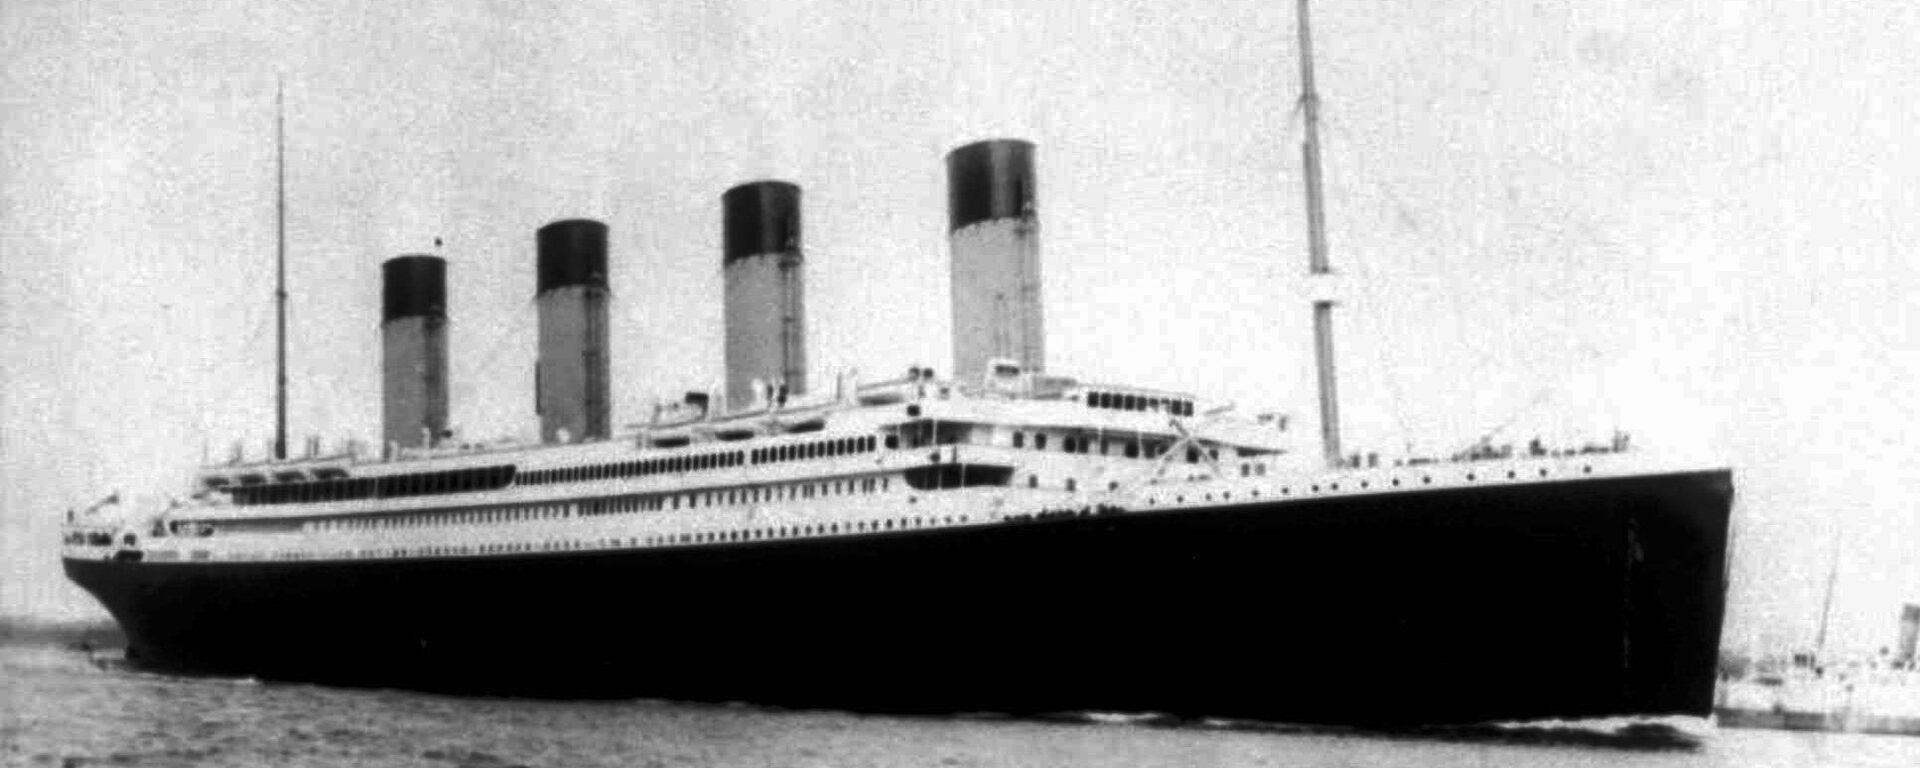 Il transatlantico Titanic - Sputnik Italia, 1920, 06.11.2020